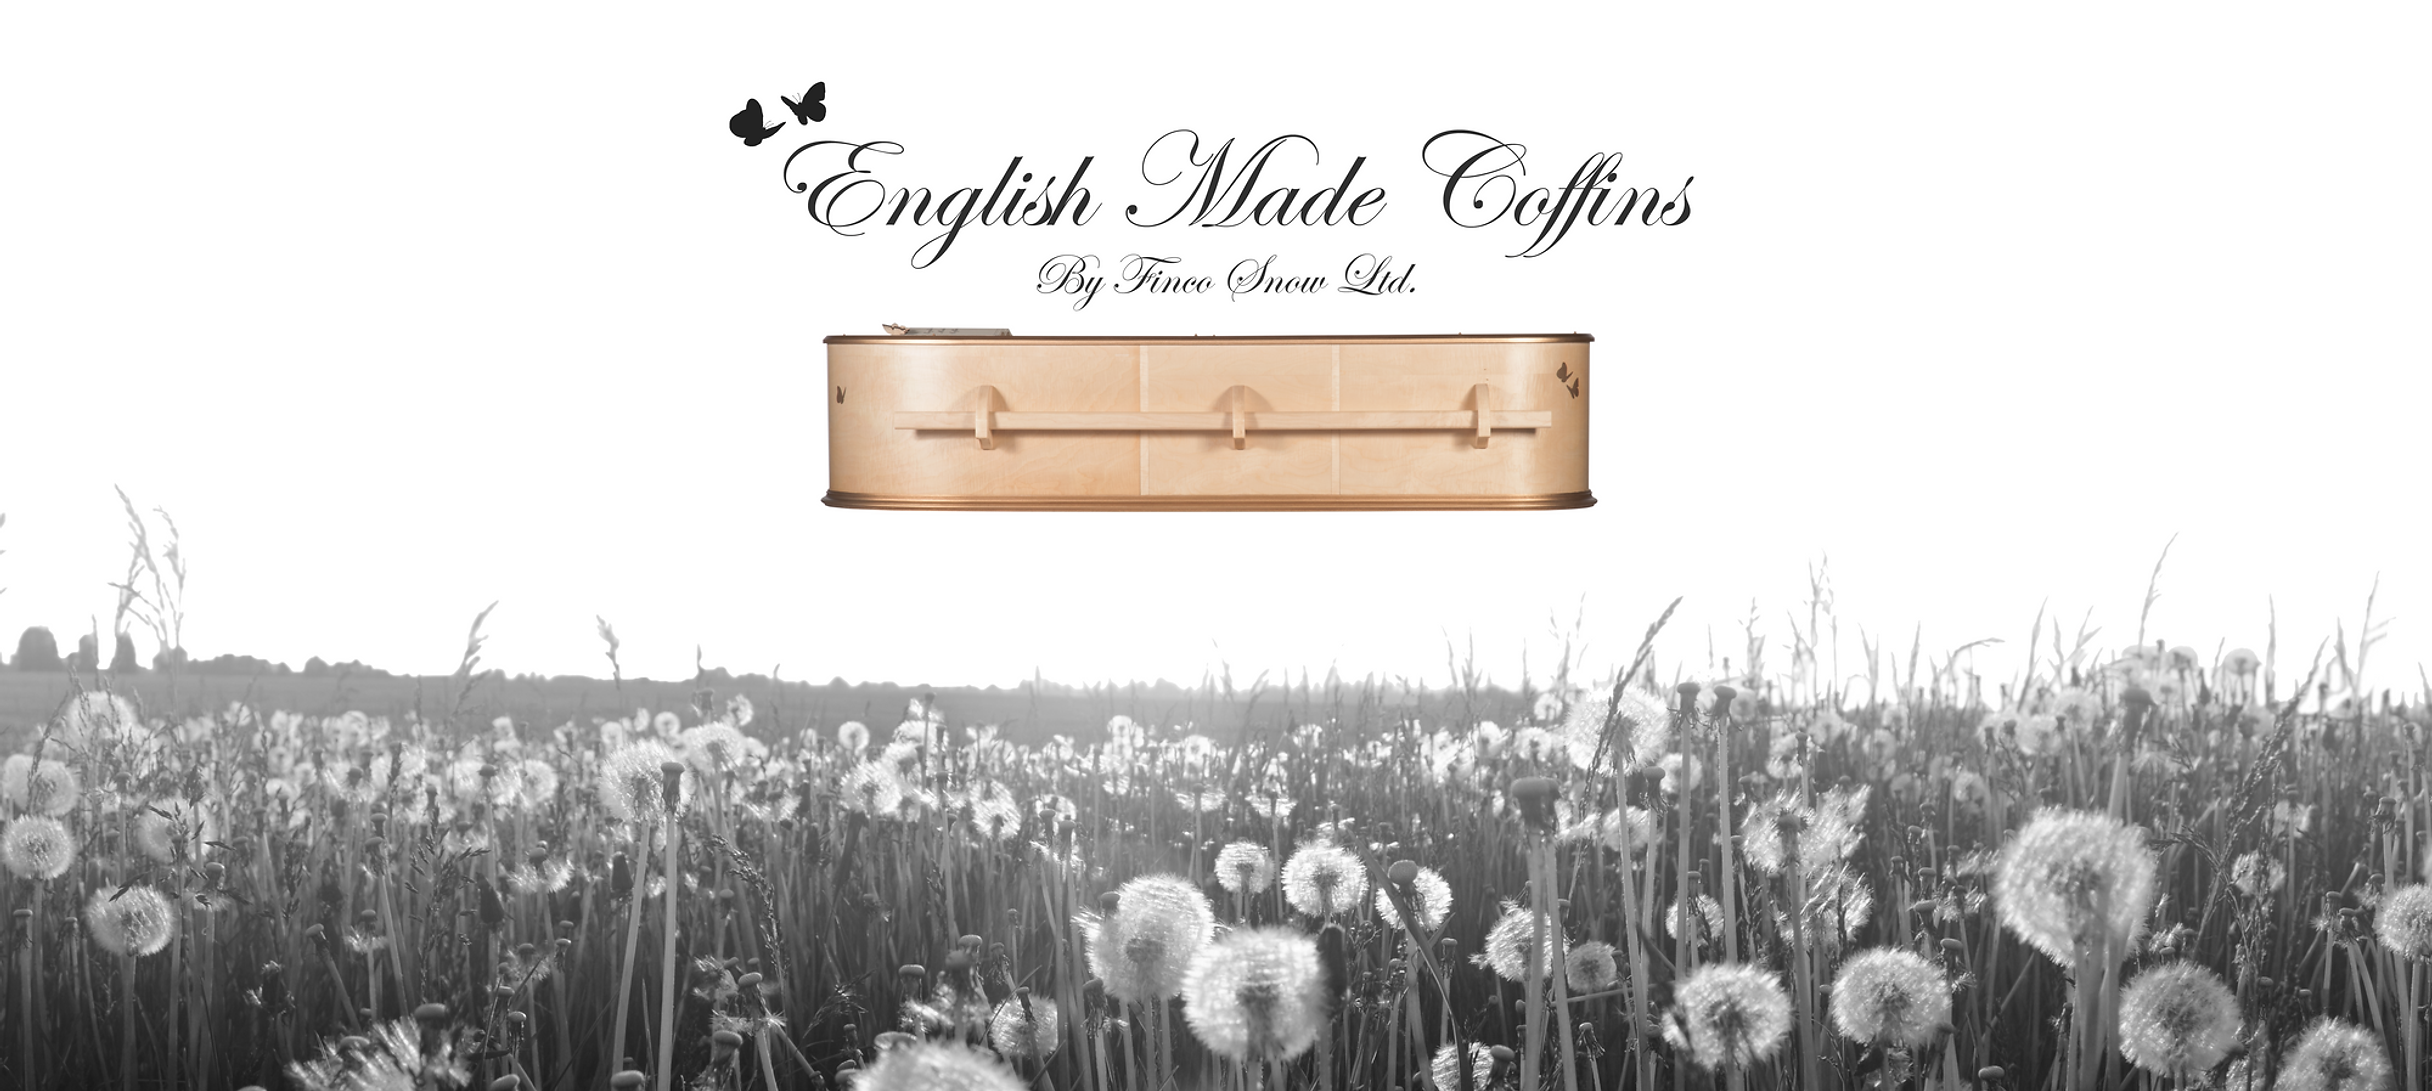 4a  Dandelion Meadow Coffin.png